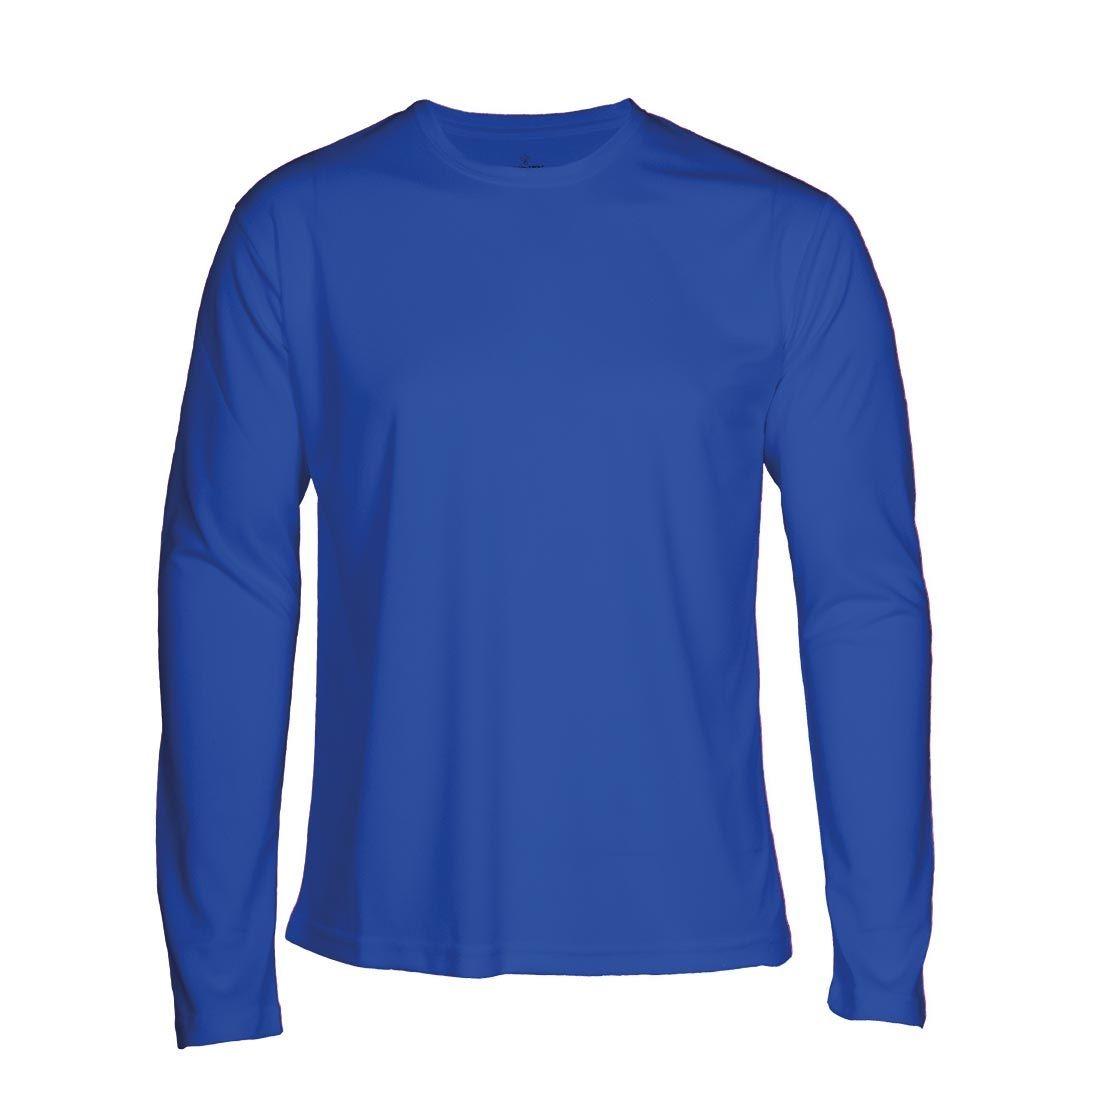 T-shirt Faster L/S royal